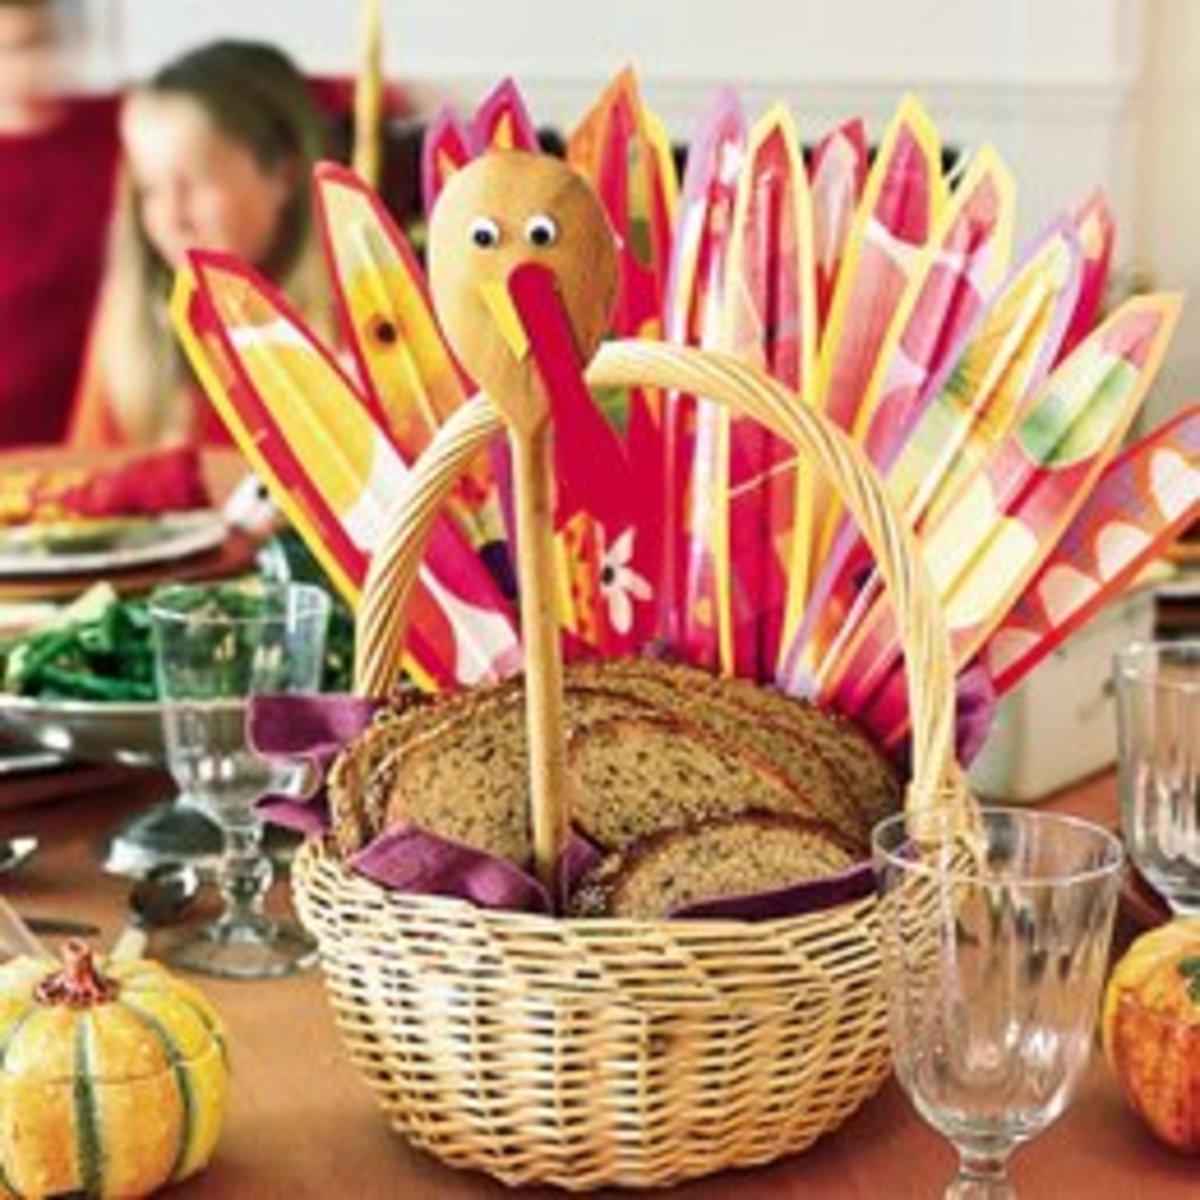 Turkey breadbasket makes a terrific centerpiece